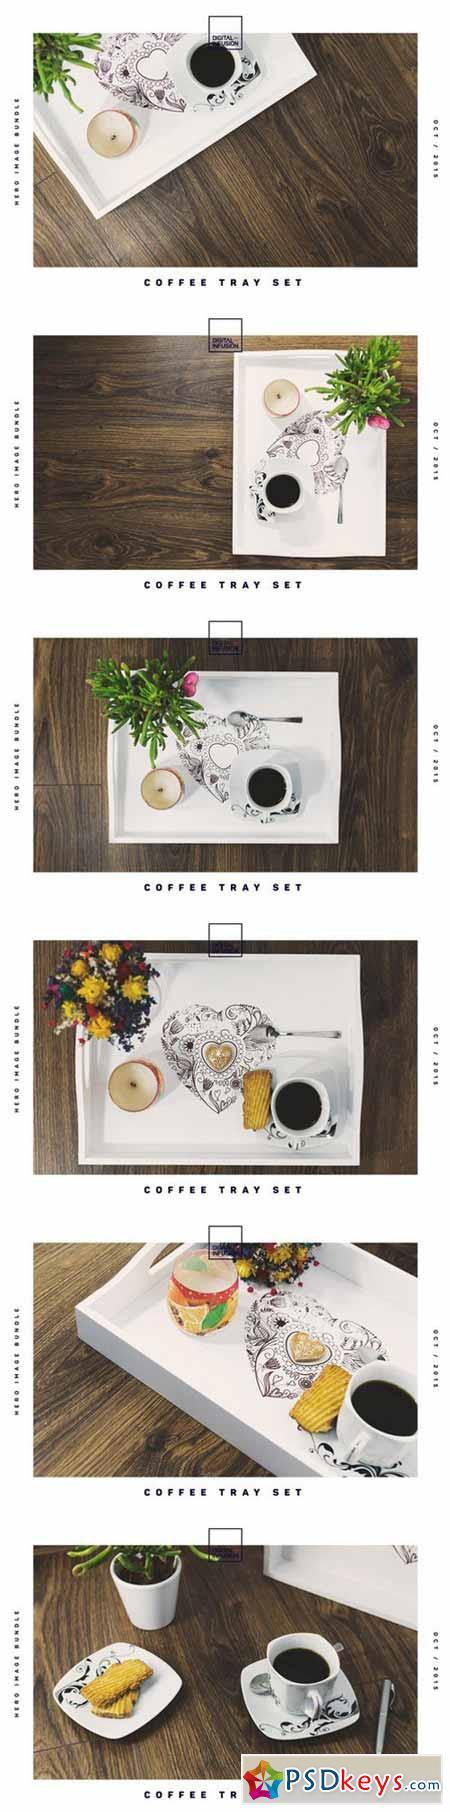 Coffee Tray Set Hero Image Bundle 409394